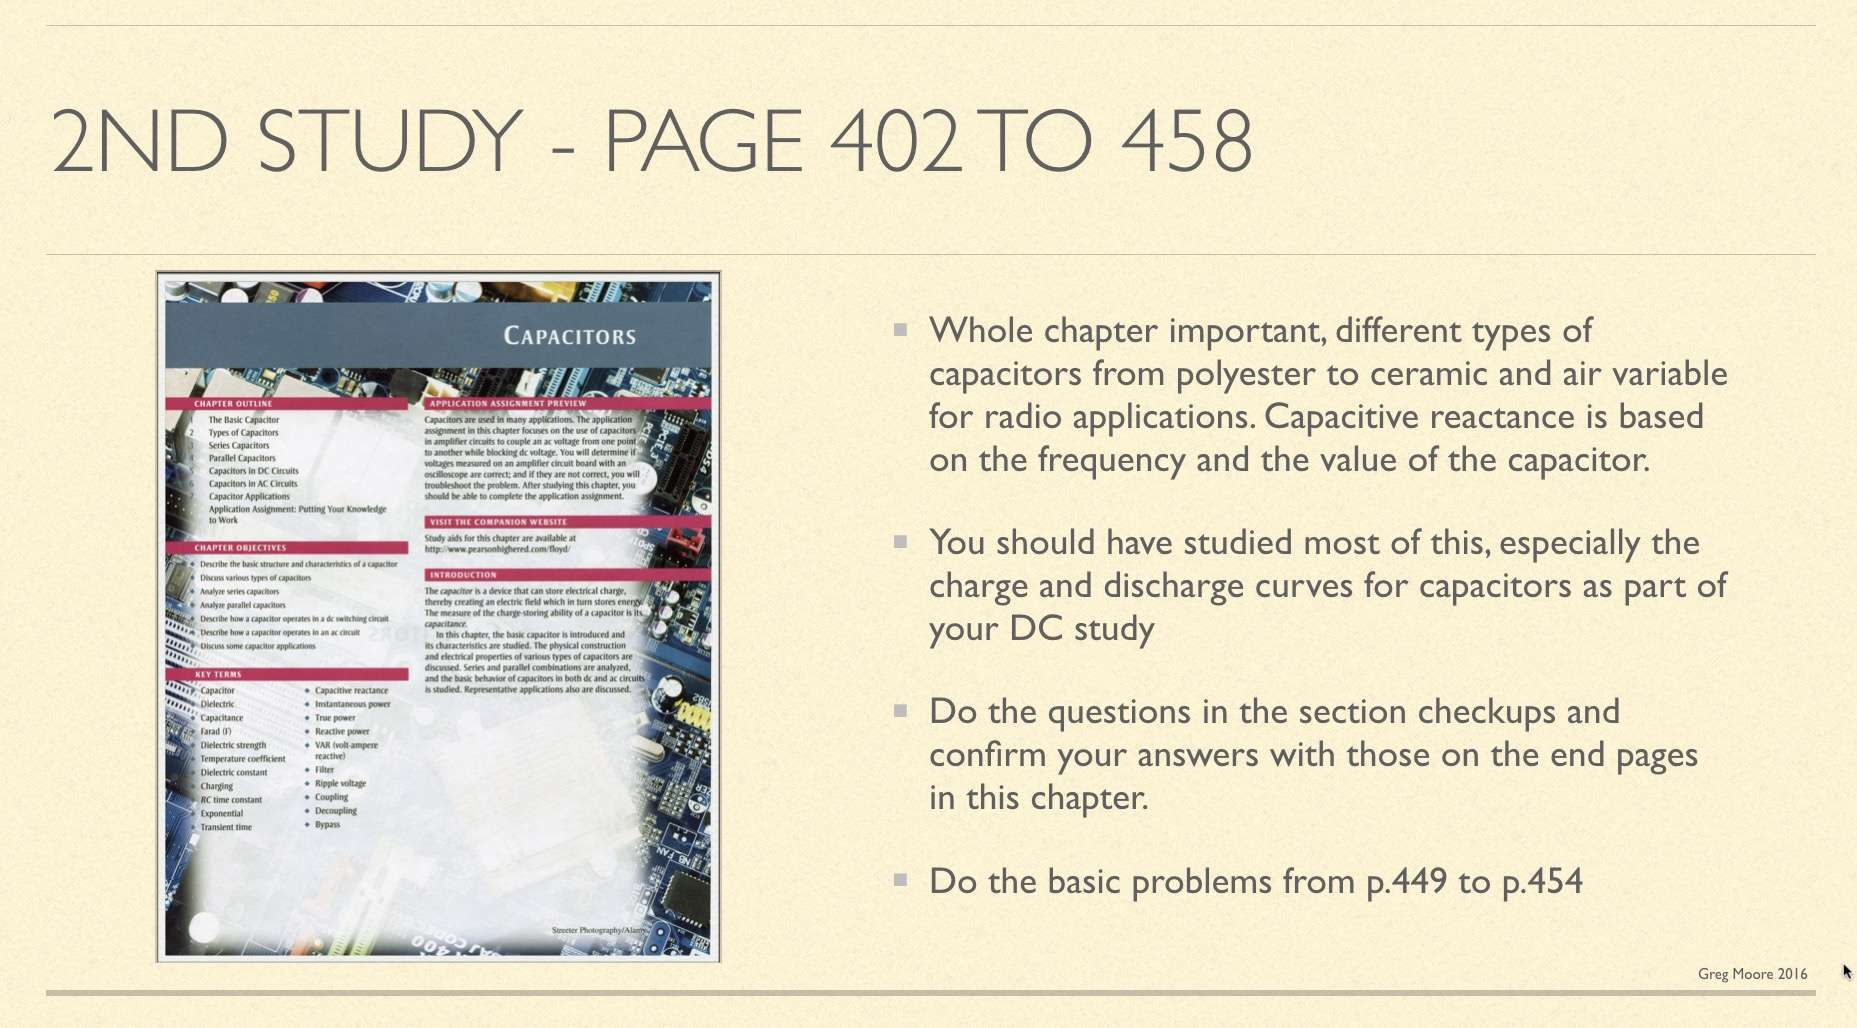 Second AC study in book